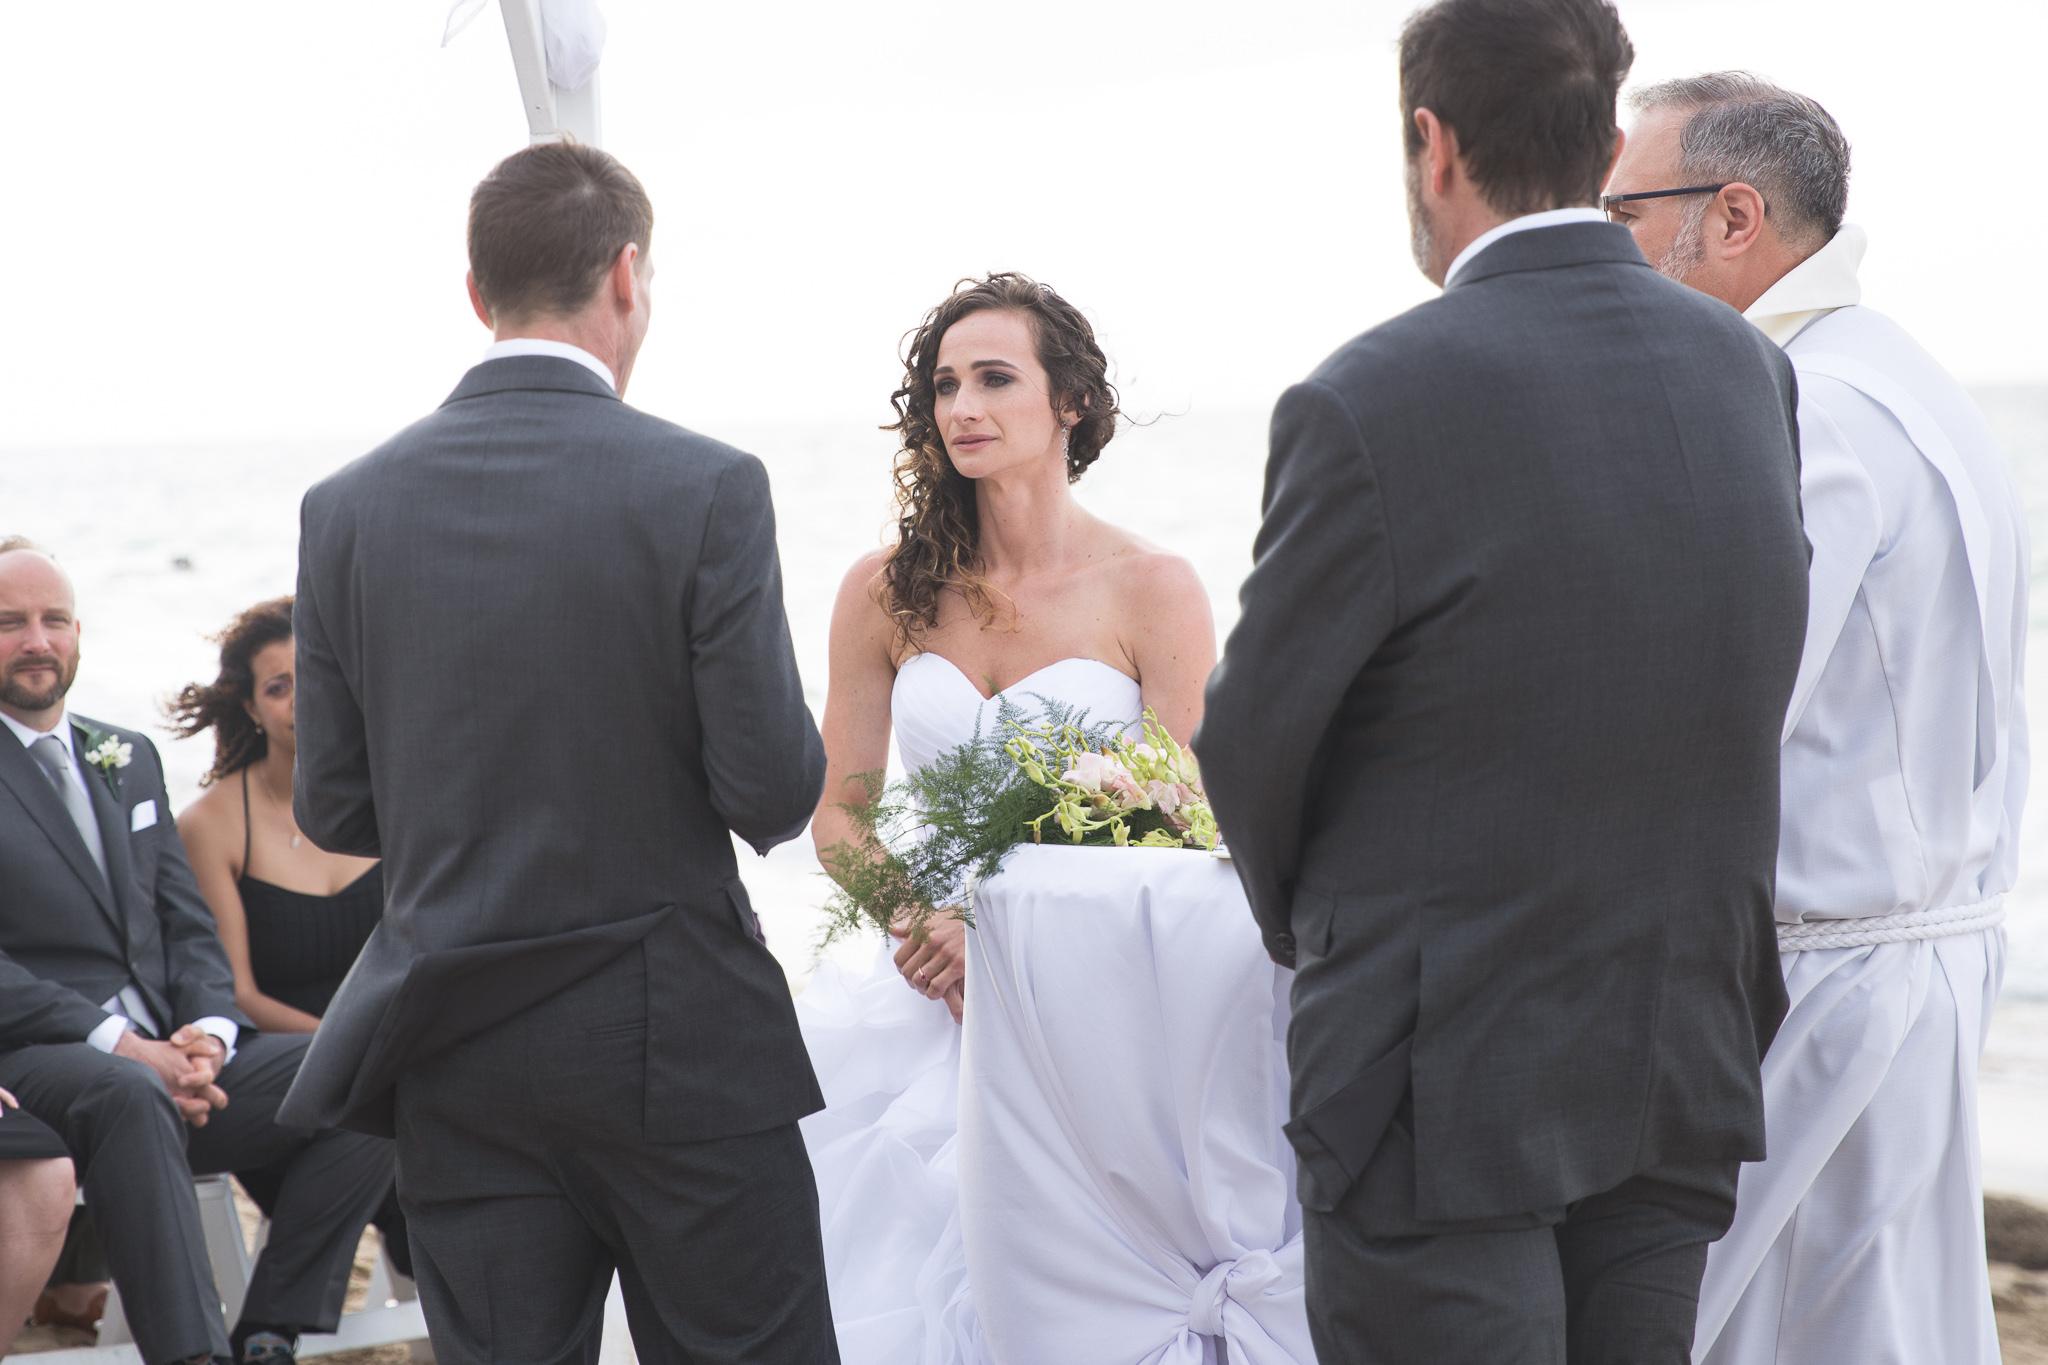 073-best-detroit-michigan-outdoor-destination-wedding-photographer.jpg